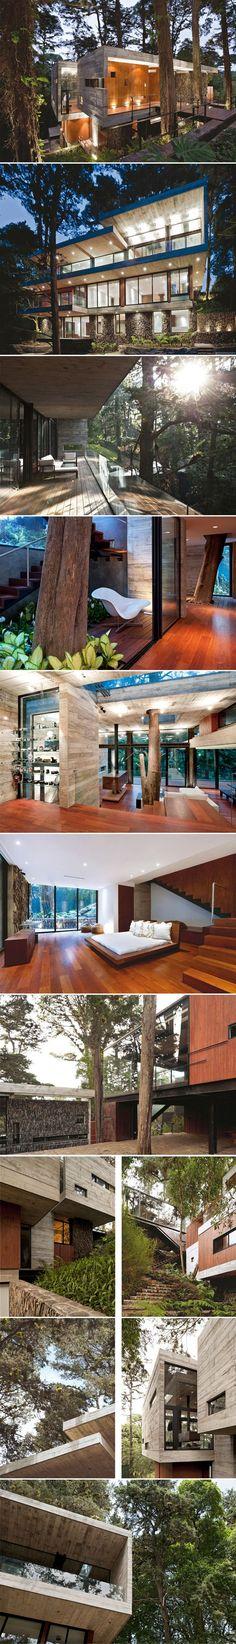 Arquitectura, concreto